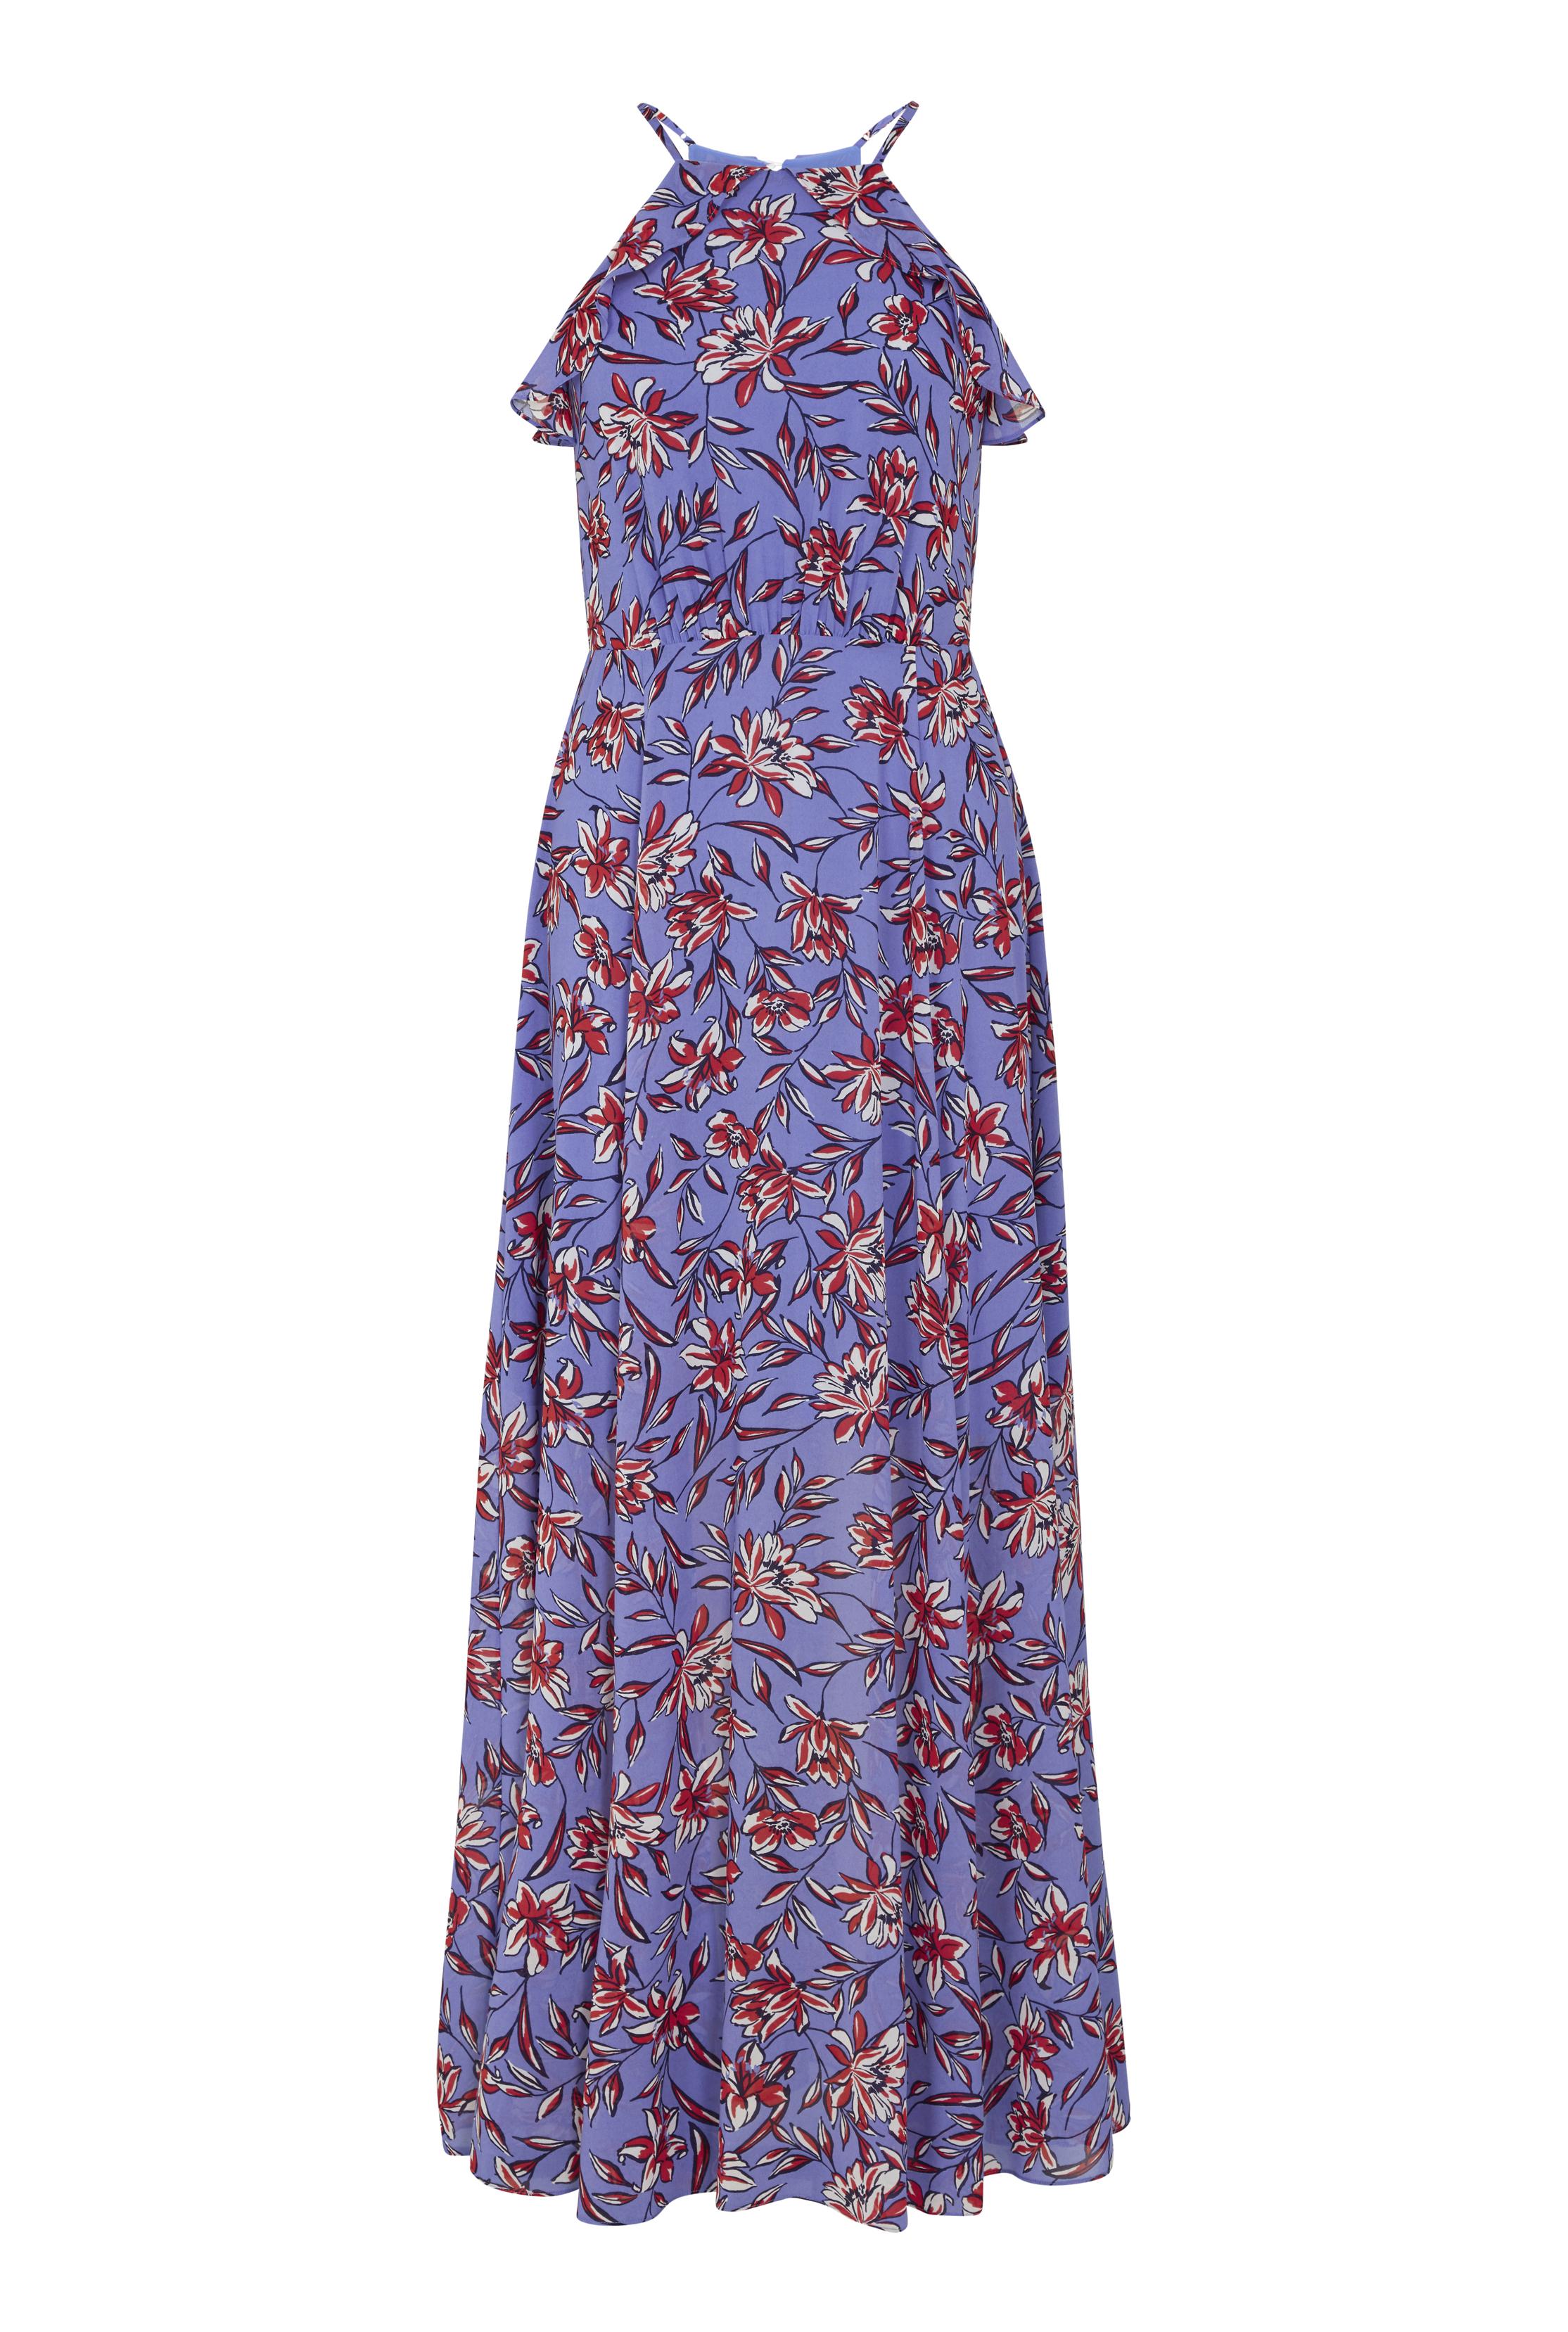 Blue Floral Ruffle Neck Chiffon Maxi Dress